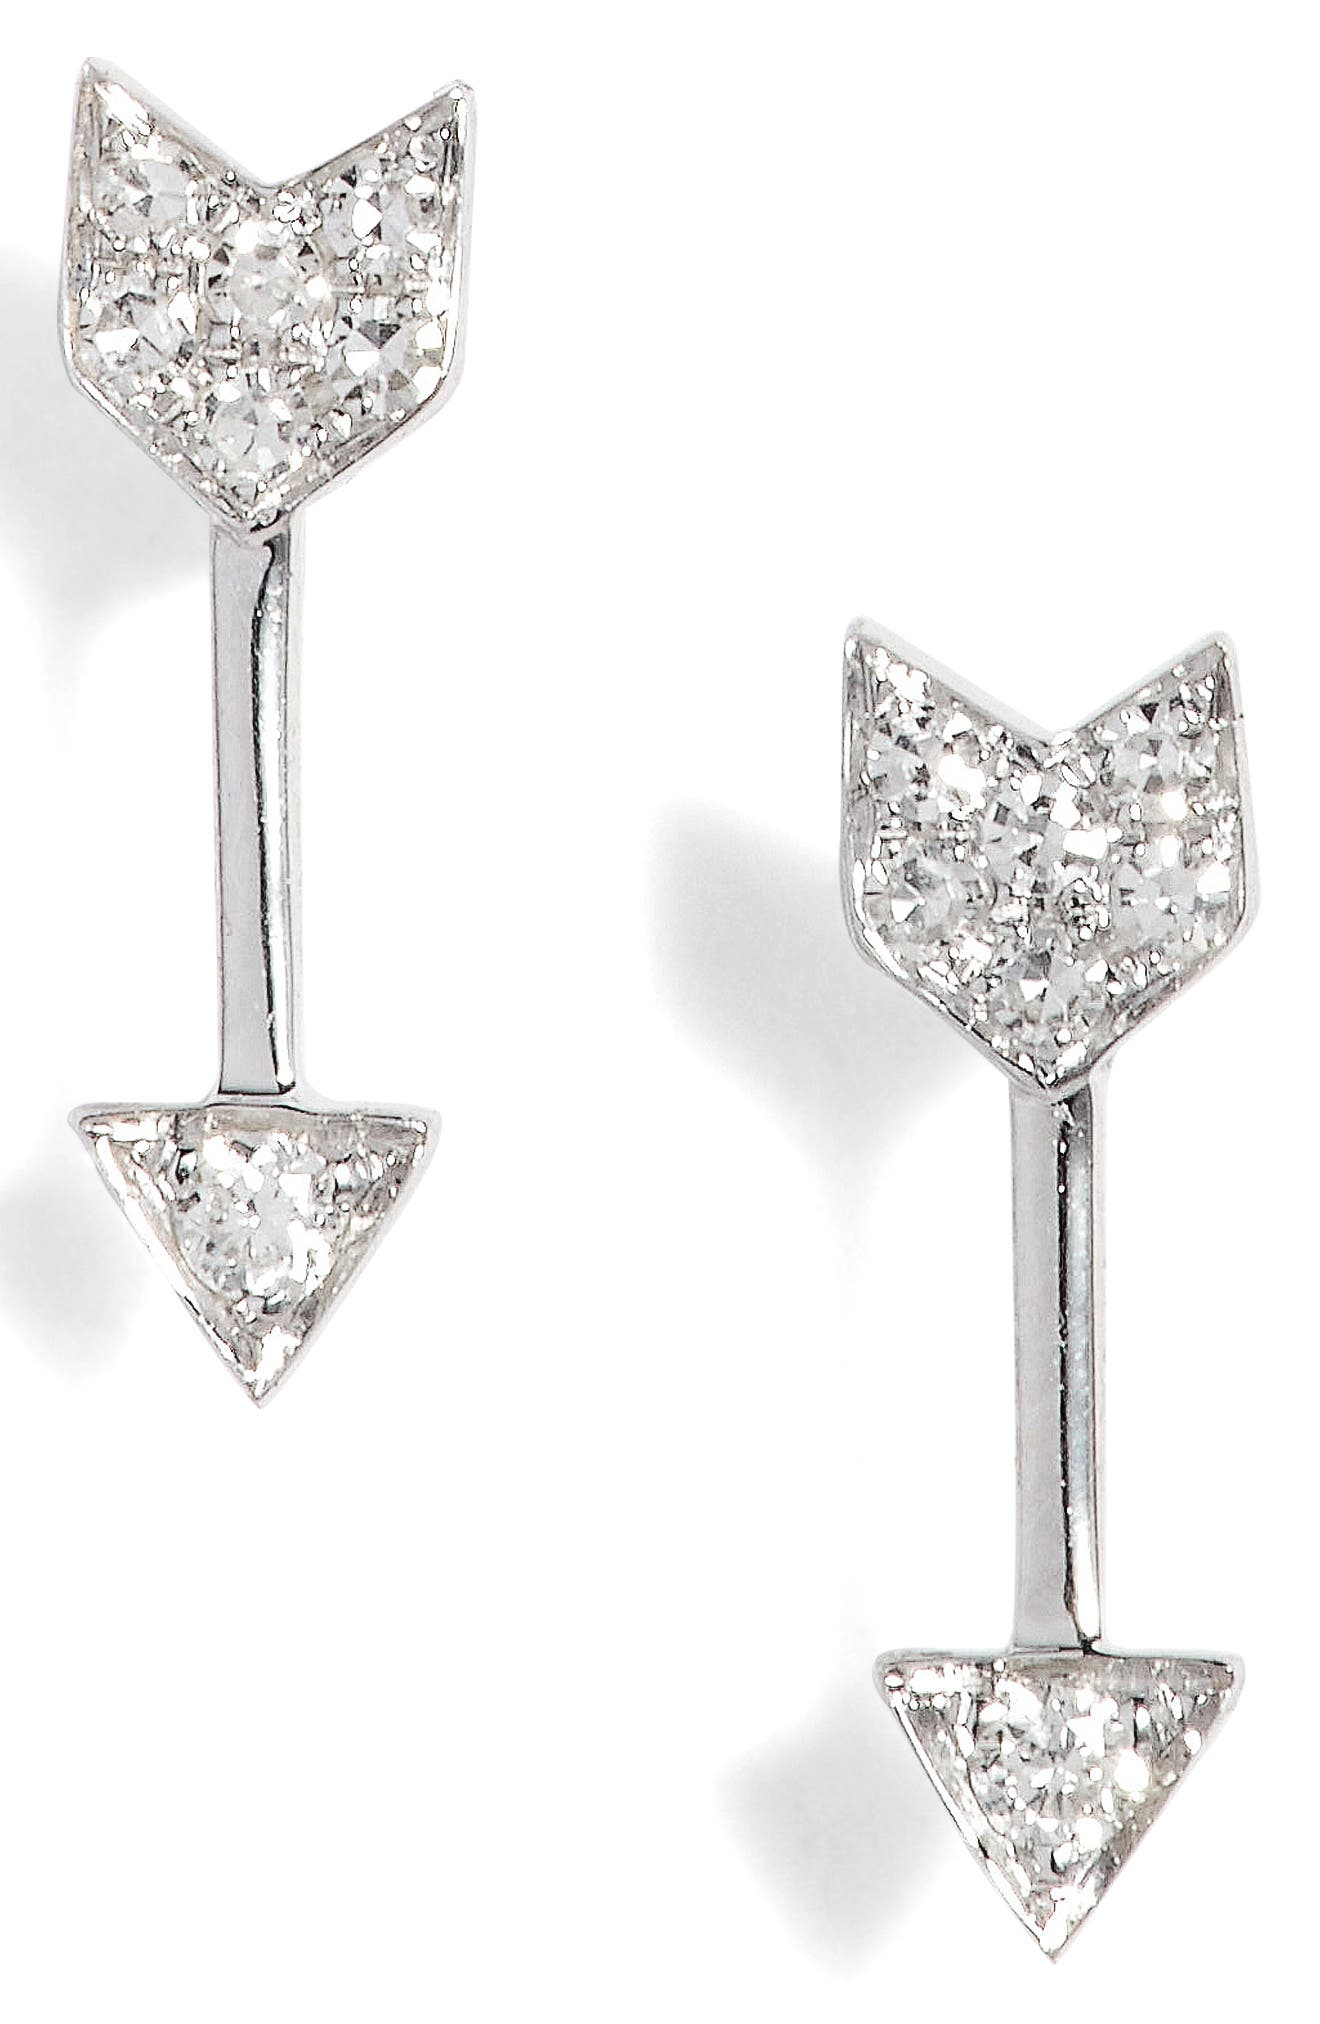 Main Image - EF COLLECTION Diamond Arrow Stud Earrings